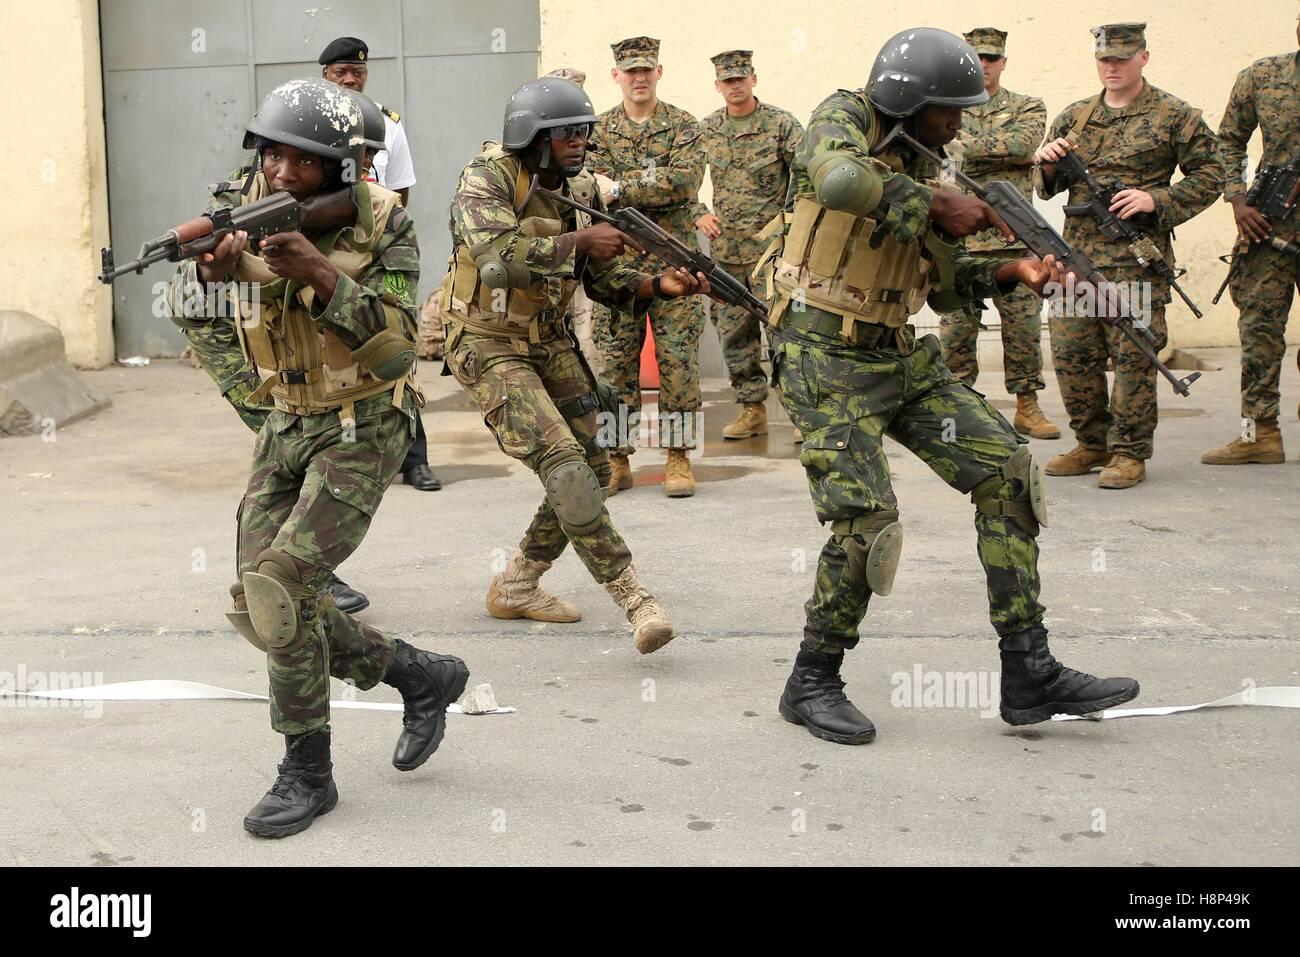 Fuzileiros Navais da Marinha de Guerra Angolana Angolan Marines practice clearing a room during a training exercise - Stock Image